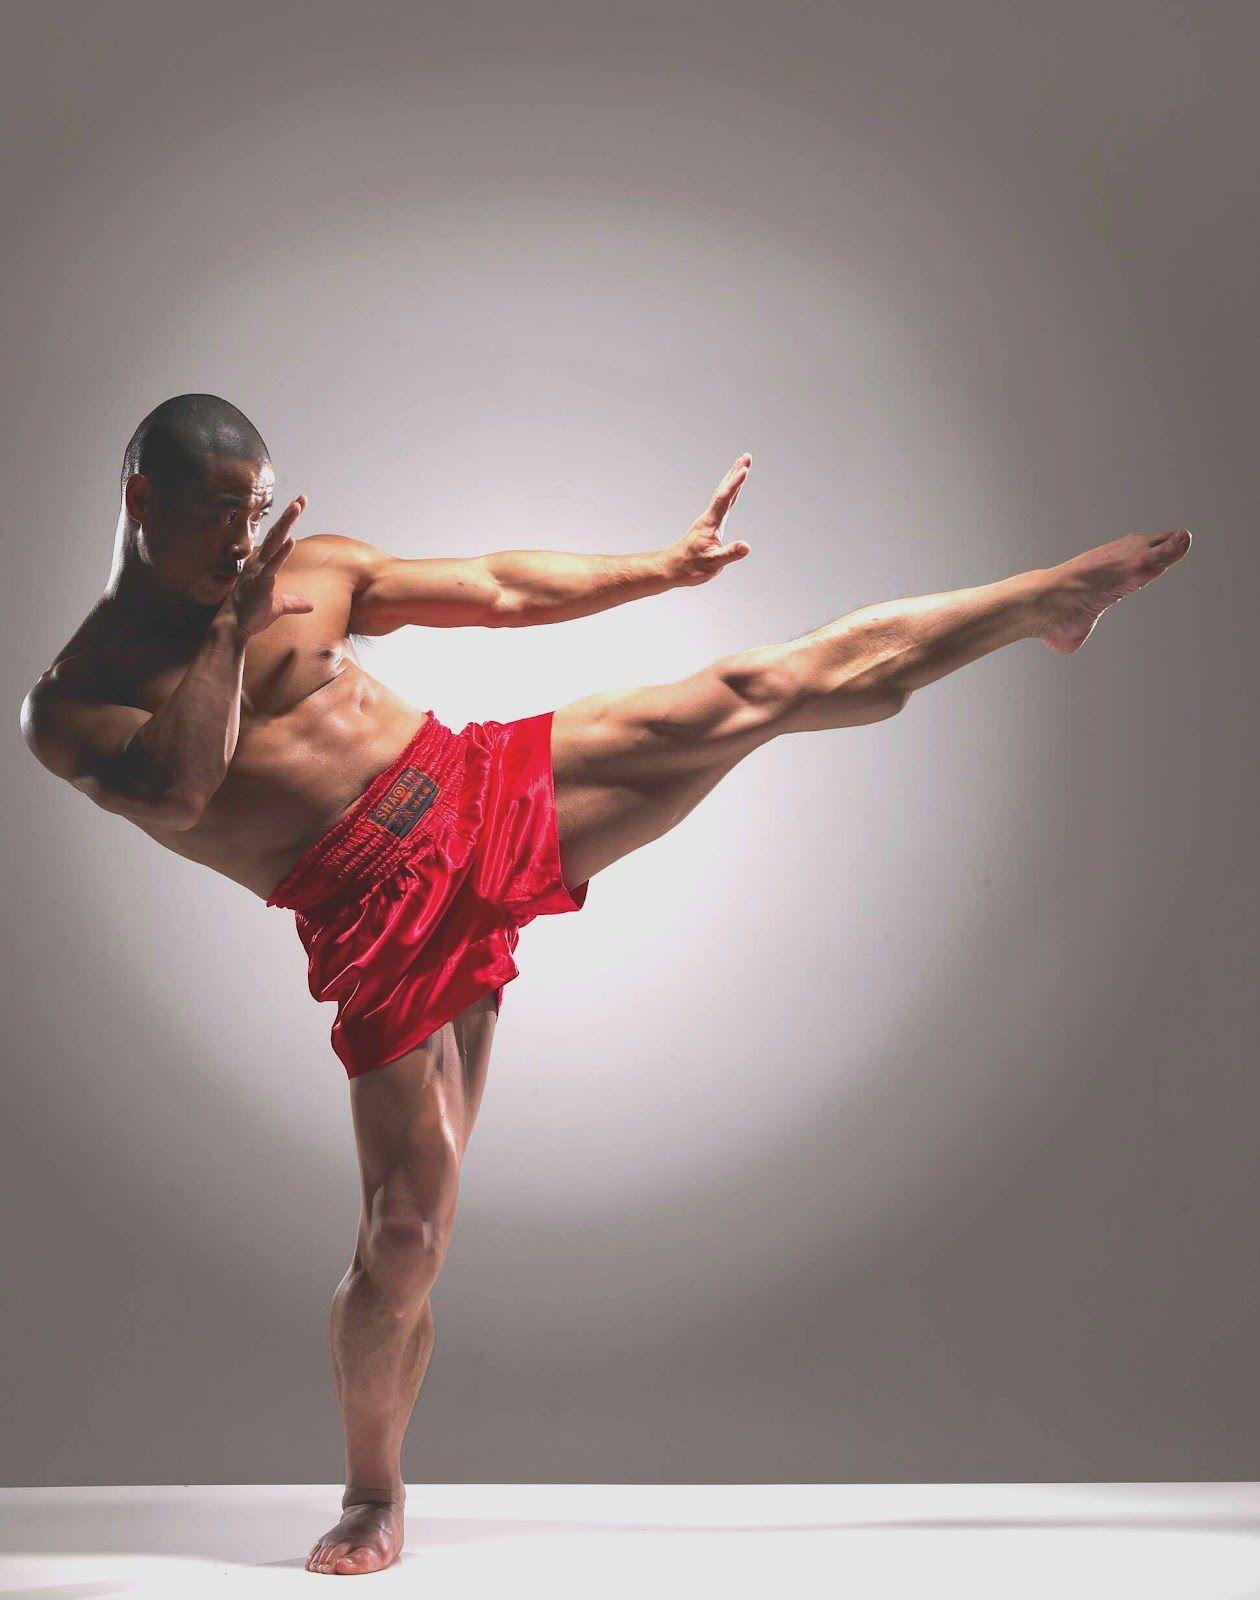 Shifu Yan Lei Your Authentic Shaolin Advisor Fighting Poses Human Poses Anatomy Poses